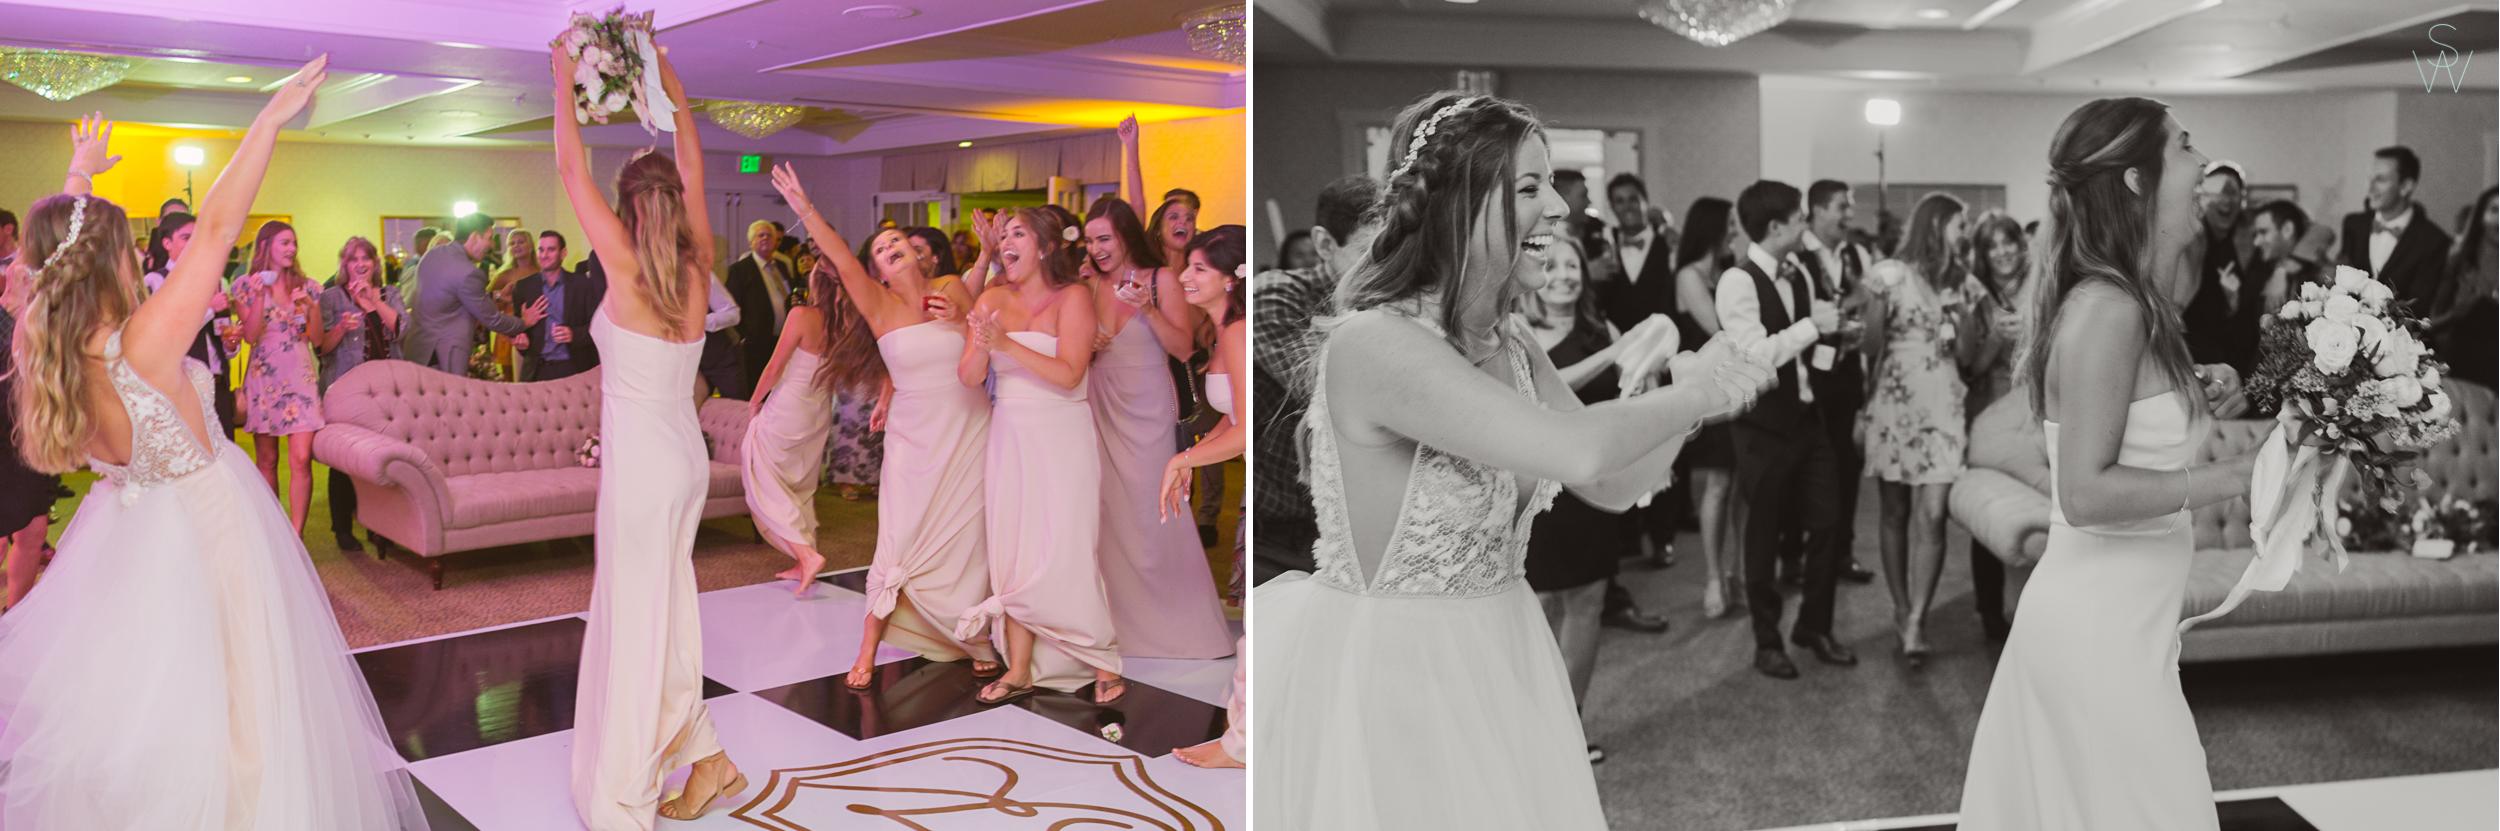 236Lauberge.shewanders.wedding.photography.JPG